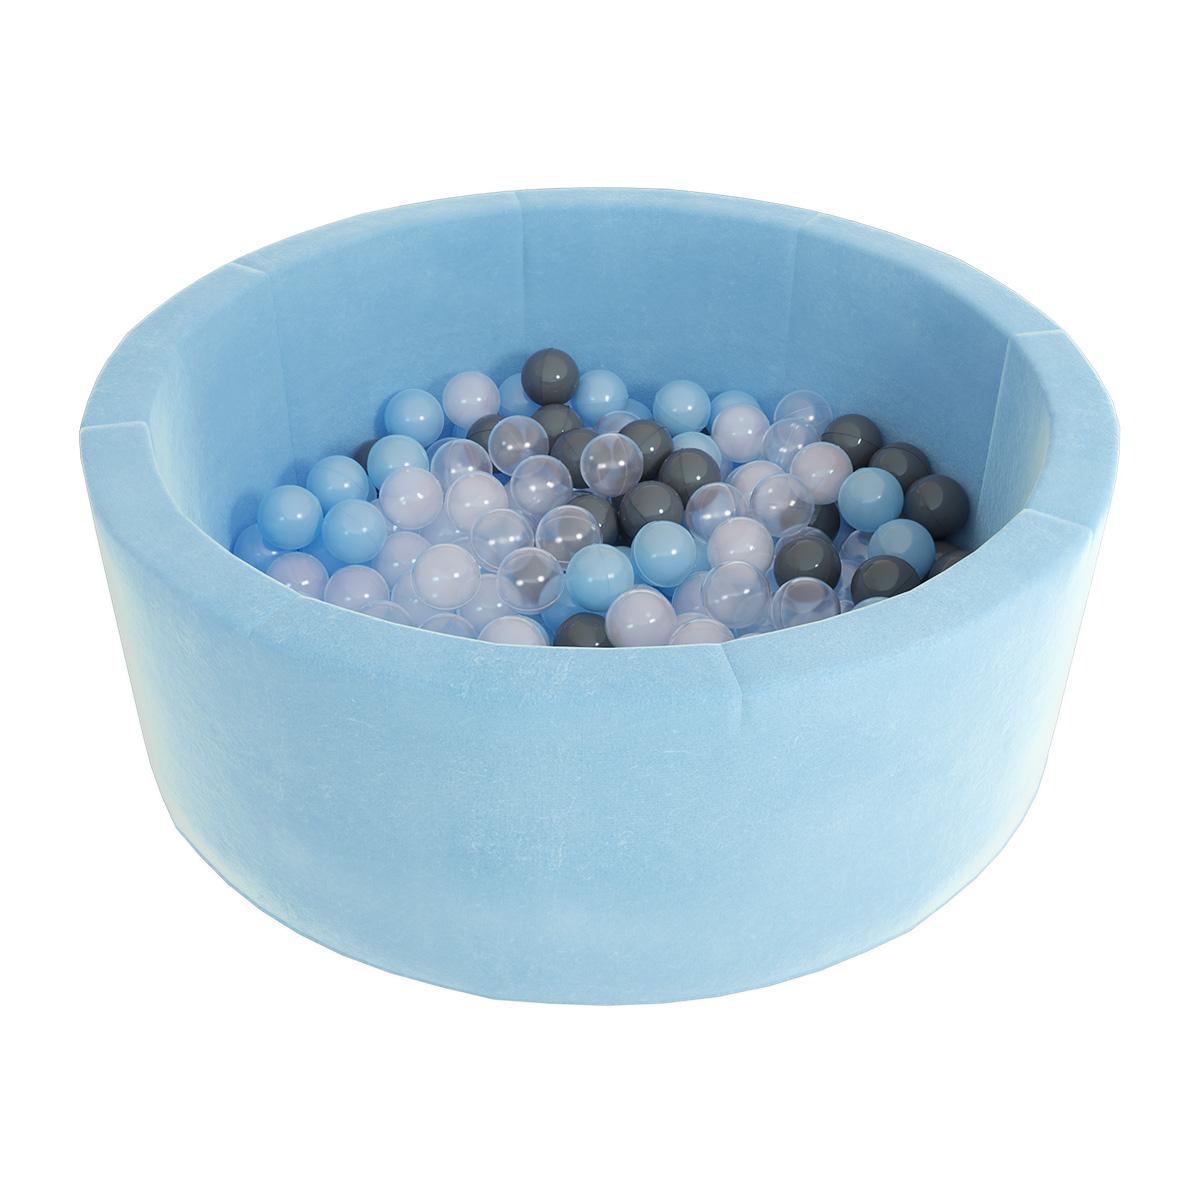 Купить Детский сухой бассейн Romana Airpool Max голубой + 200 шаров, Romana (Романа)